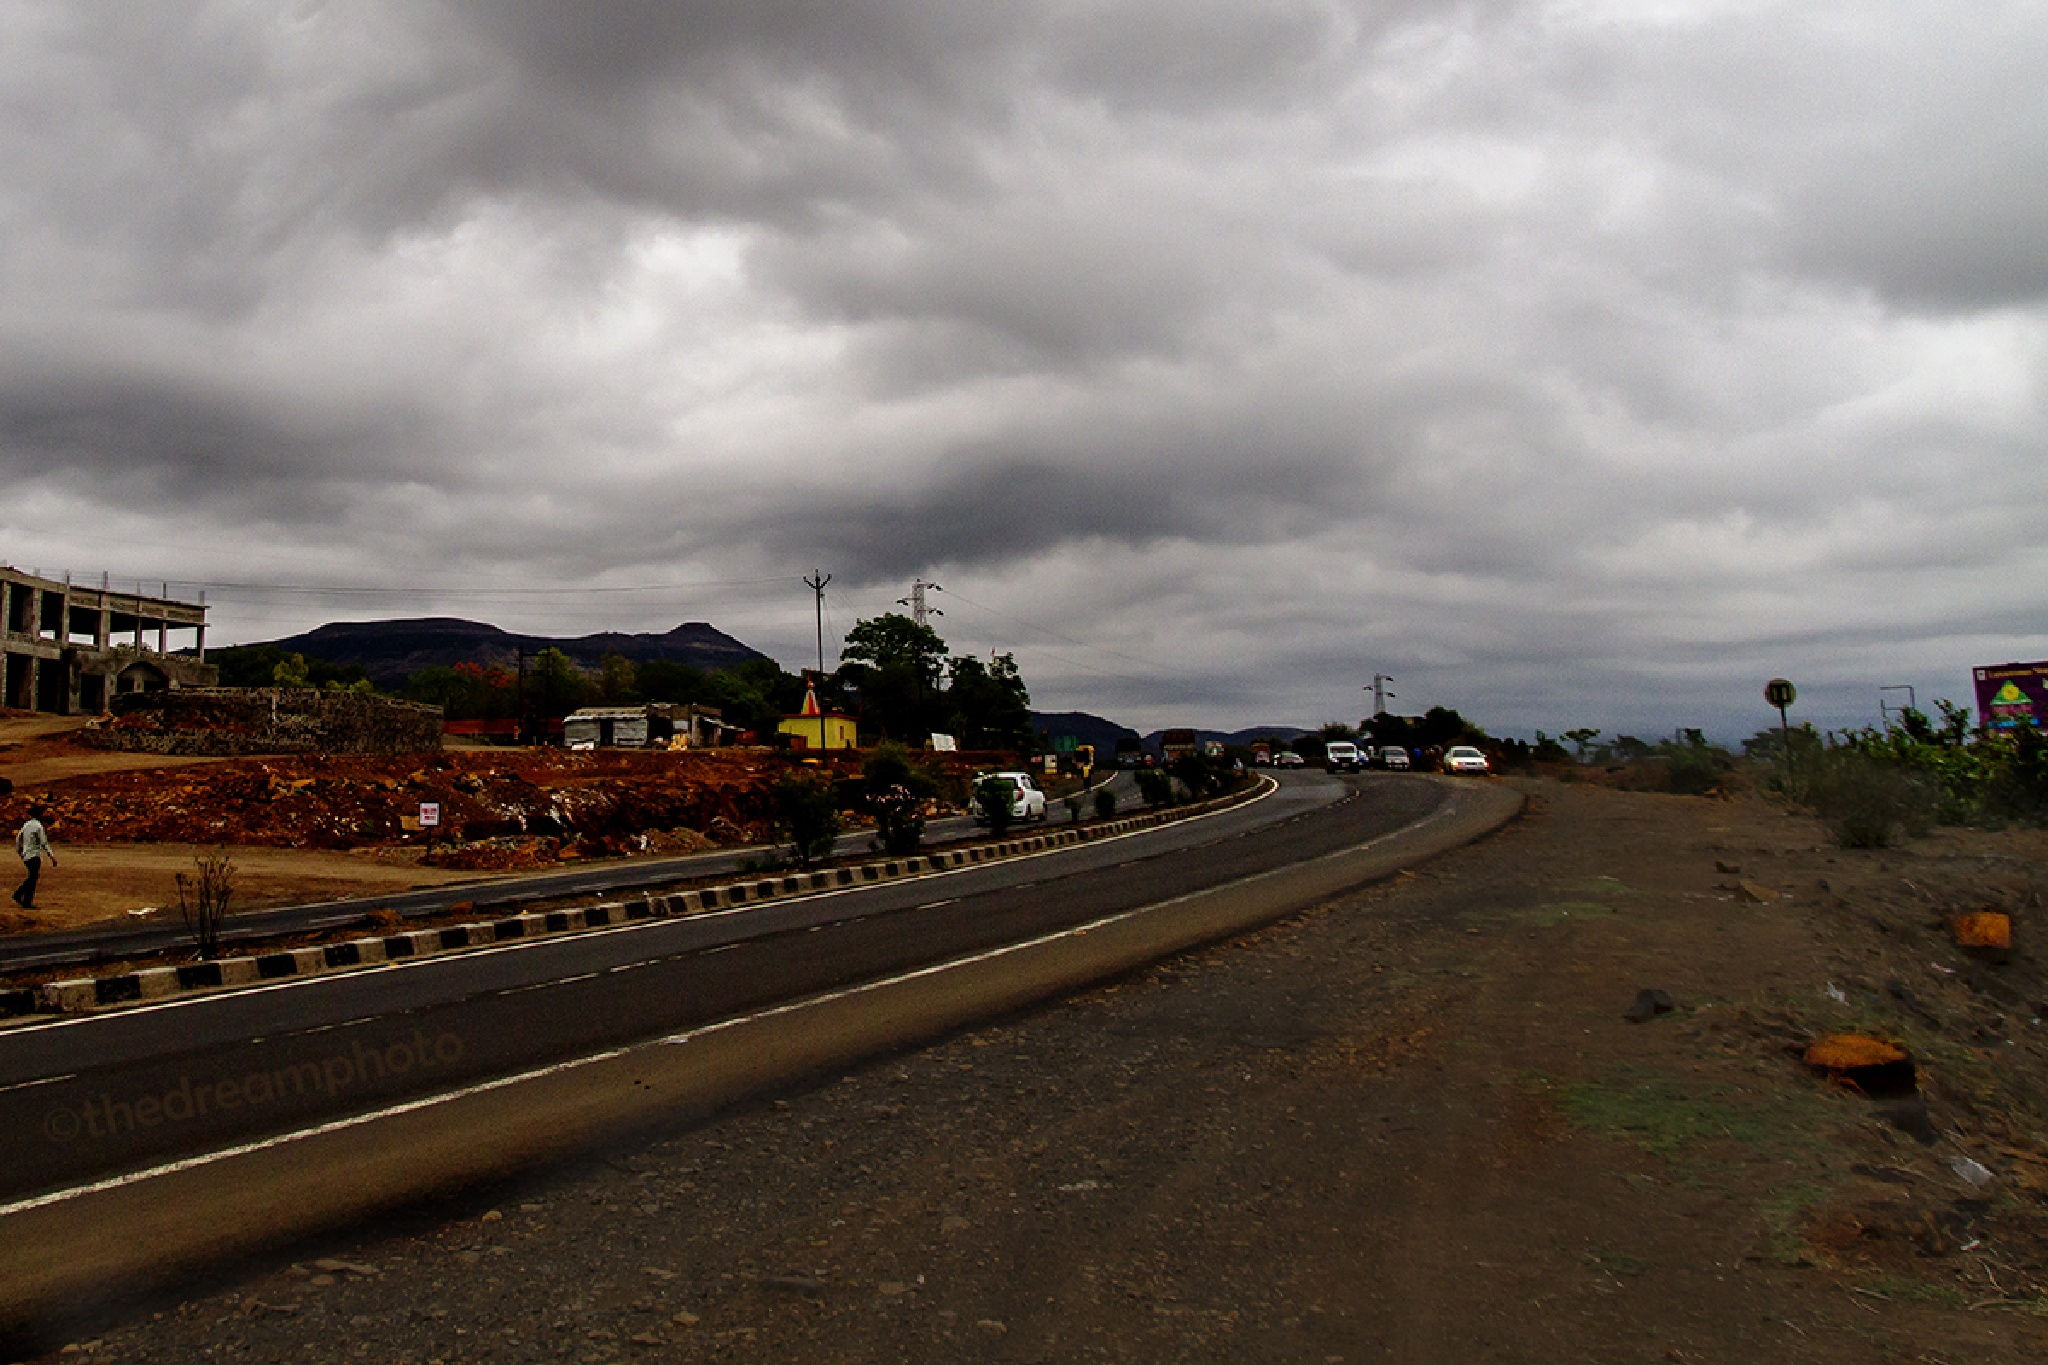 Road trip by Sushil Dhanawde